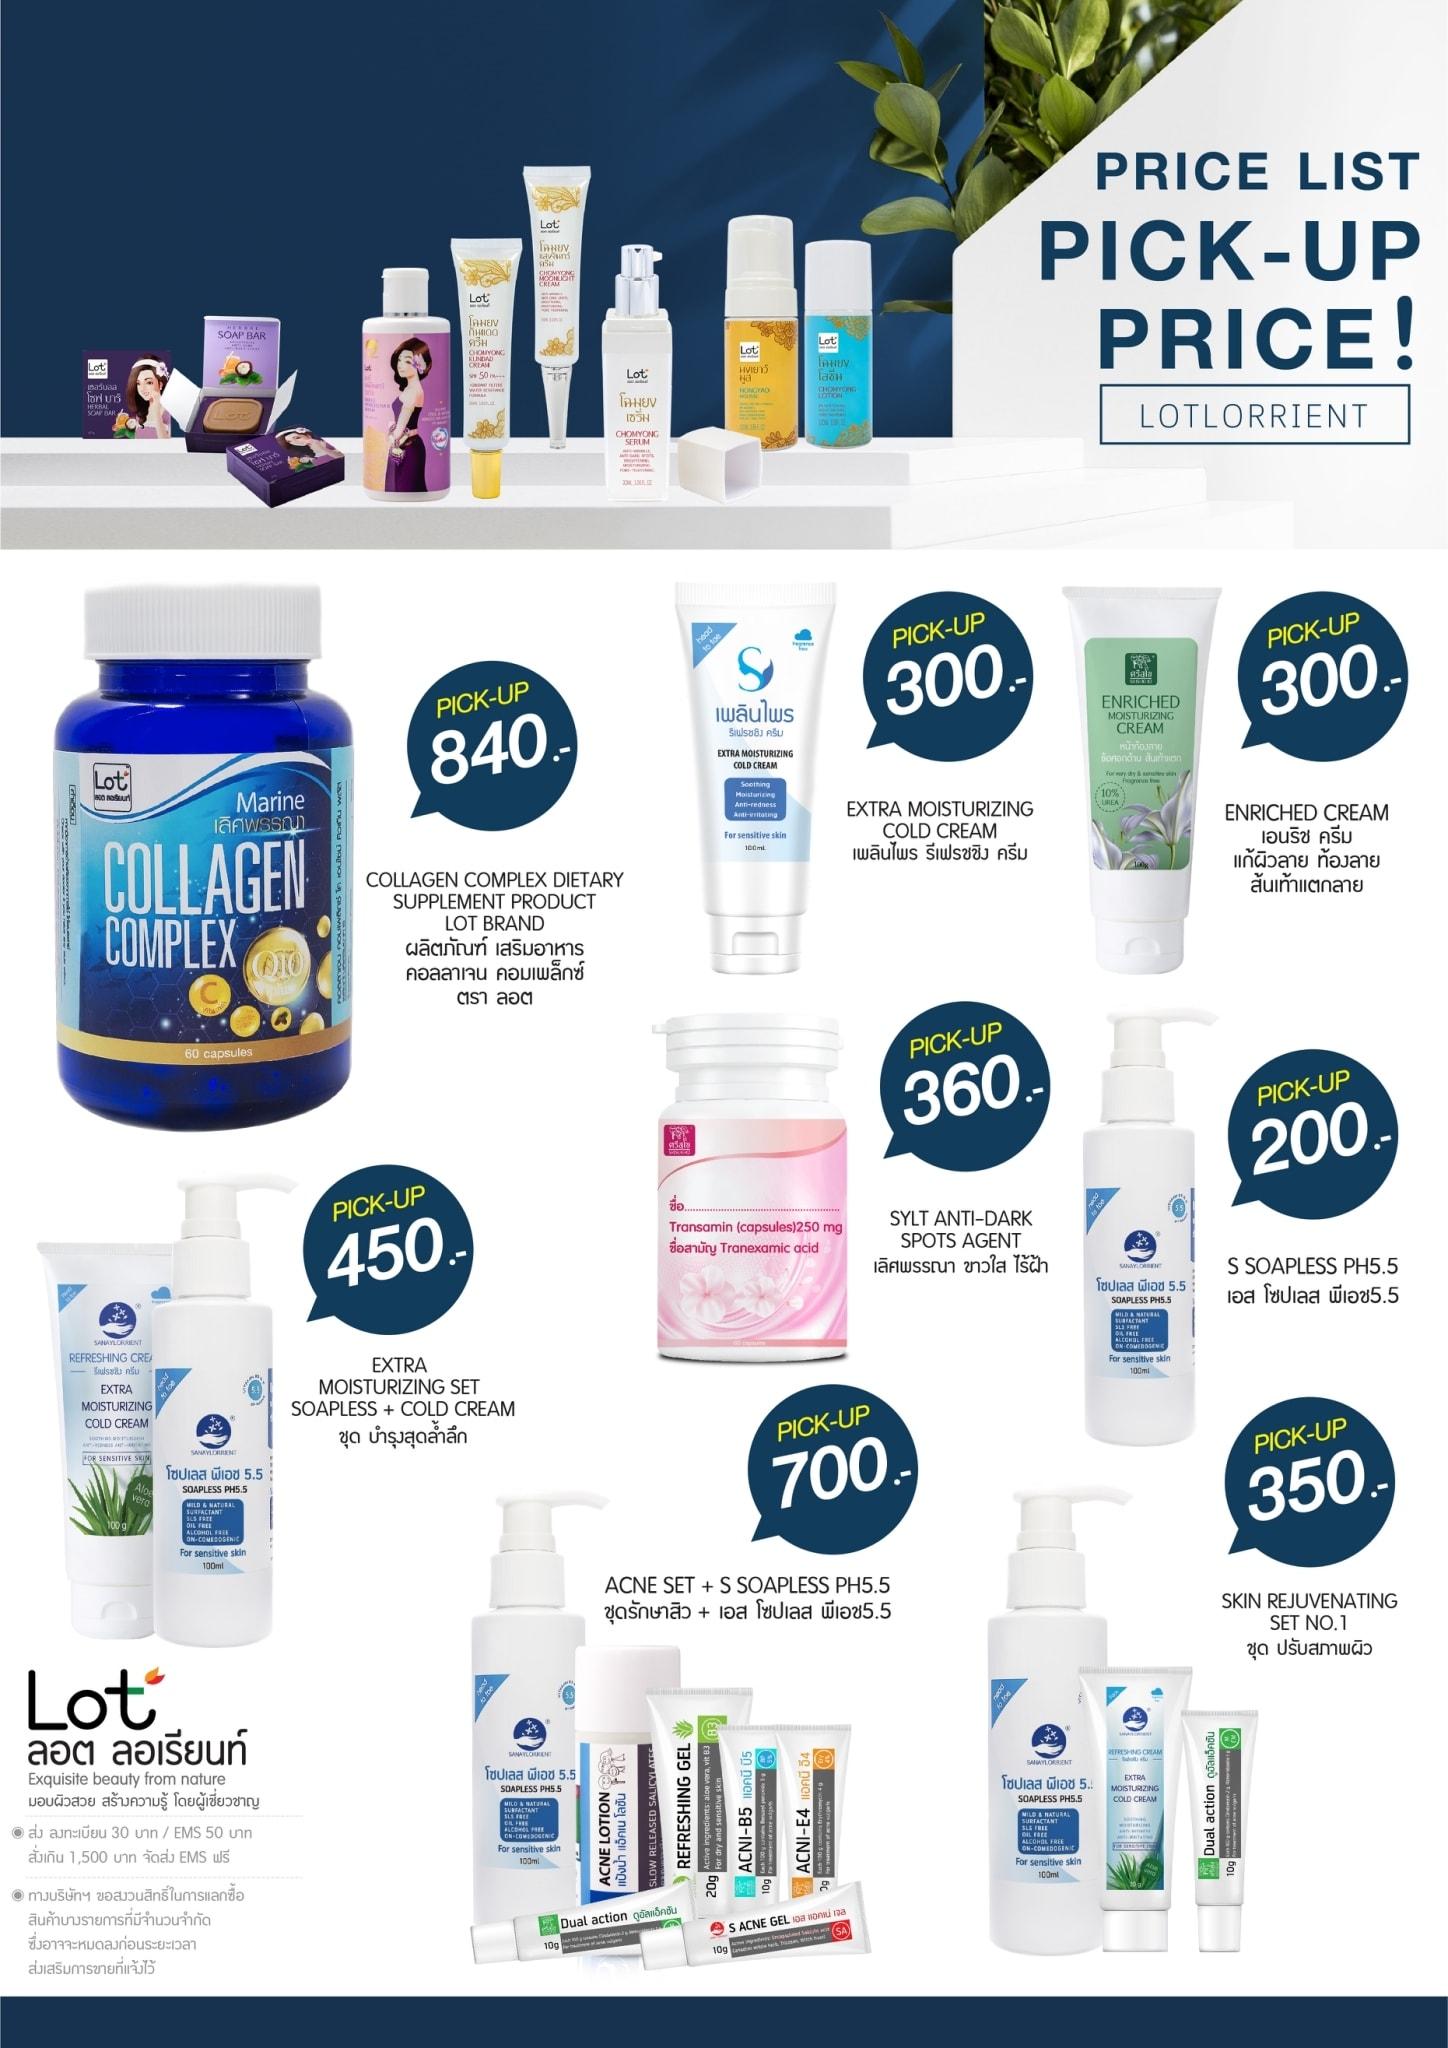 LOT ลอต ลอเรียนท์, 2019 pricelist , ราคากลาง ผลิตภัณฑ์